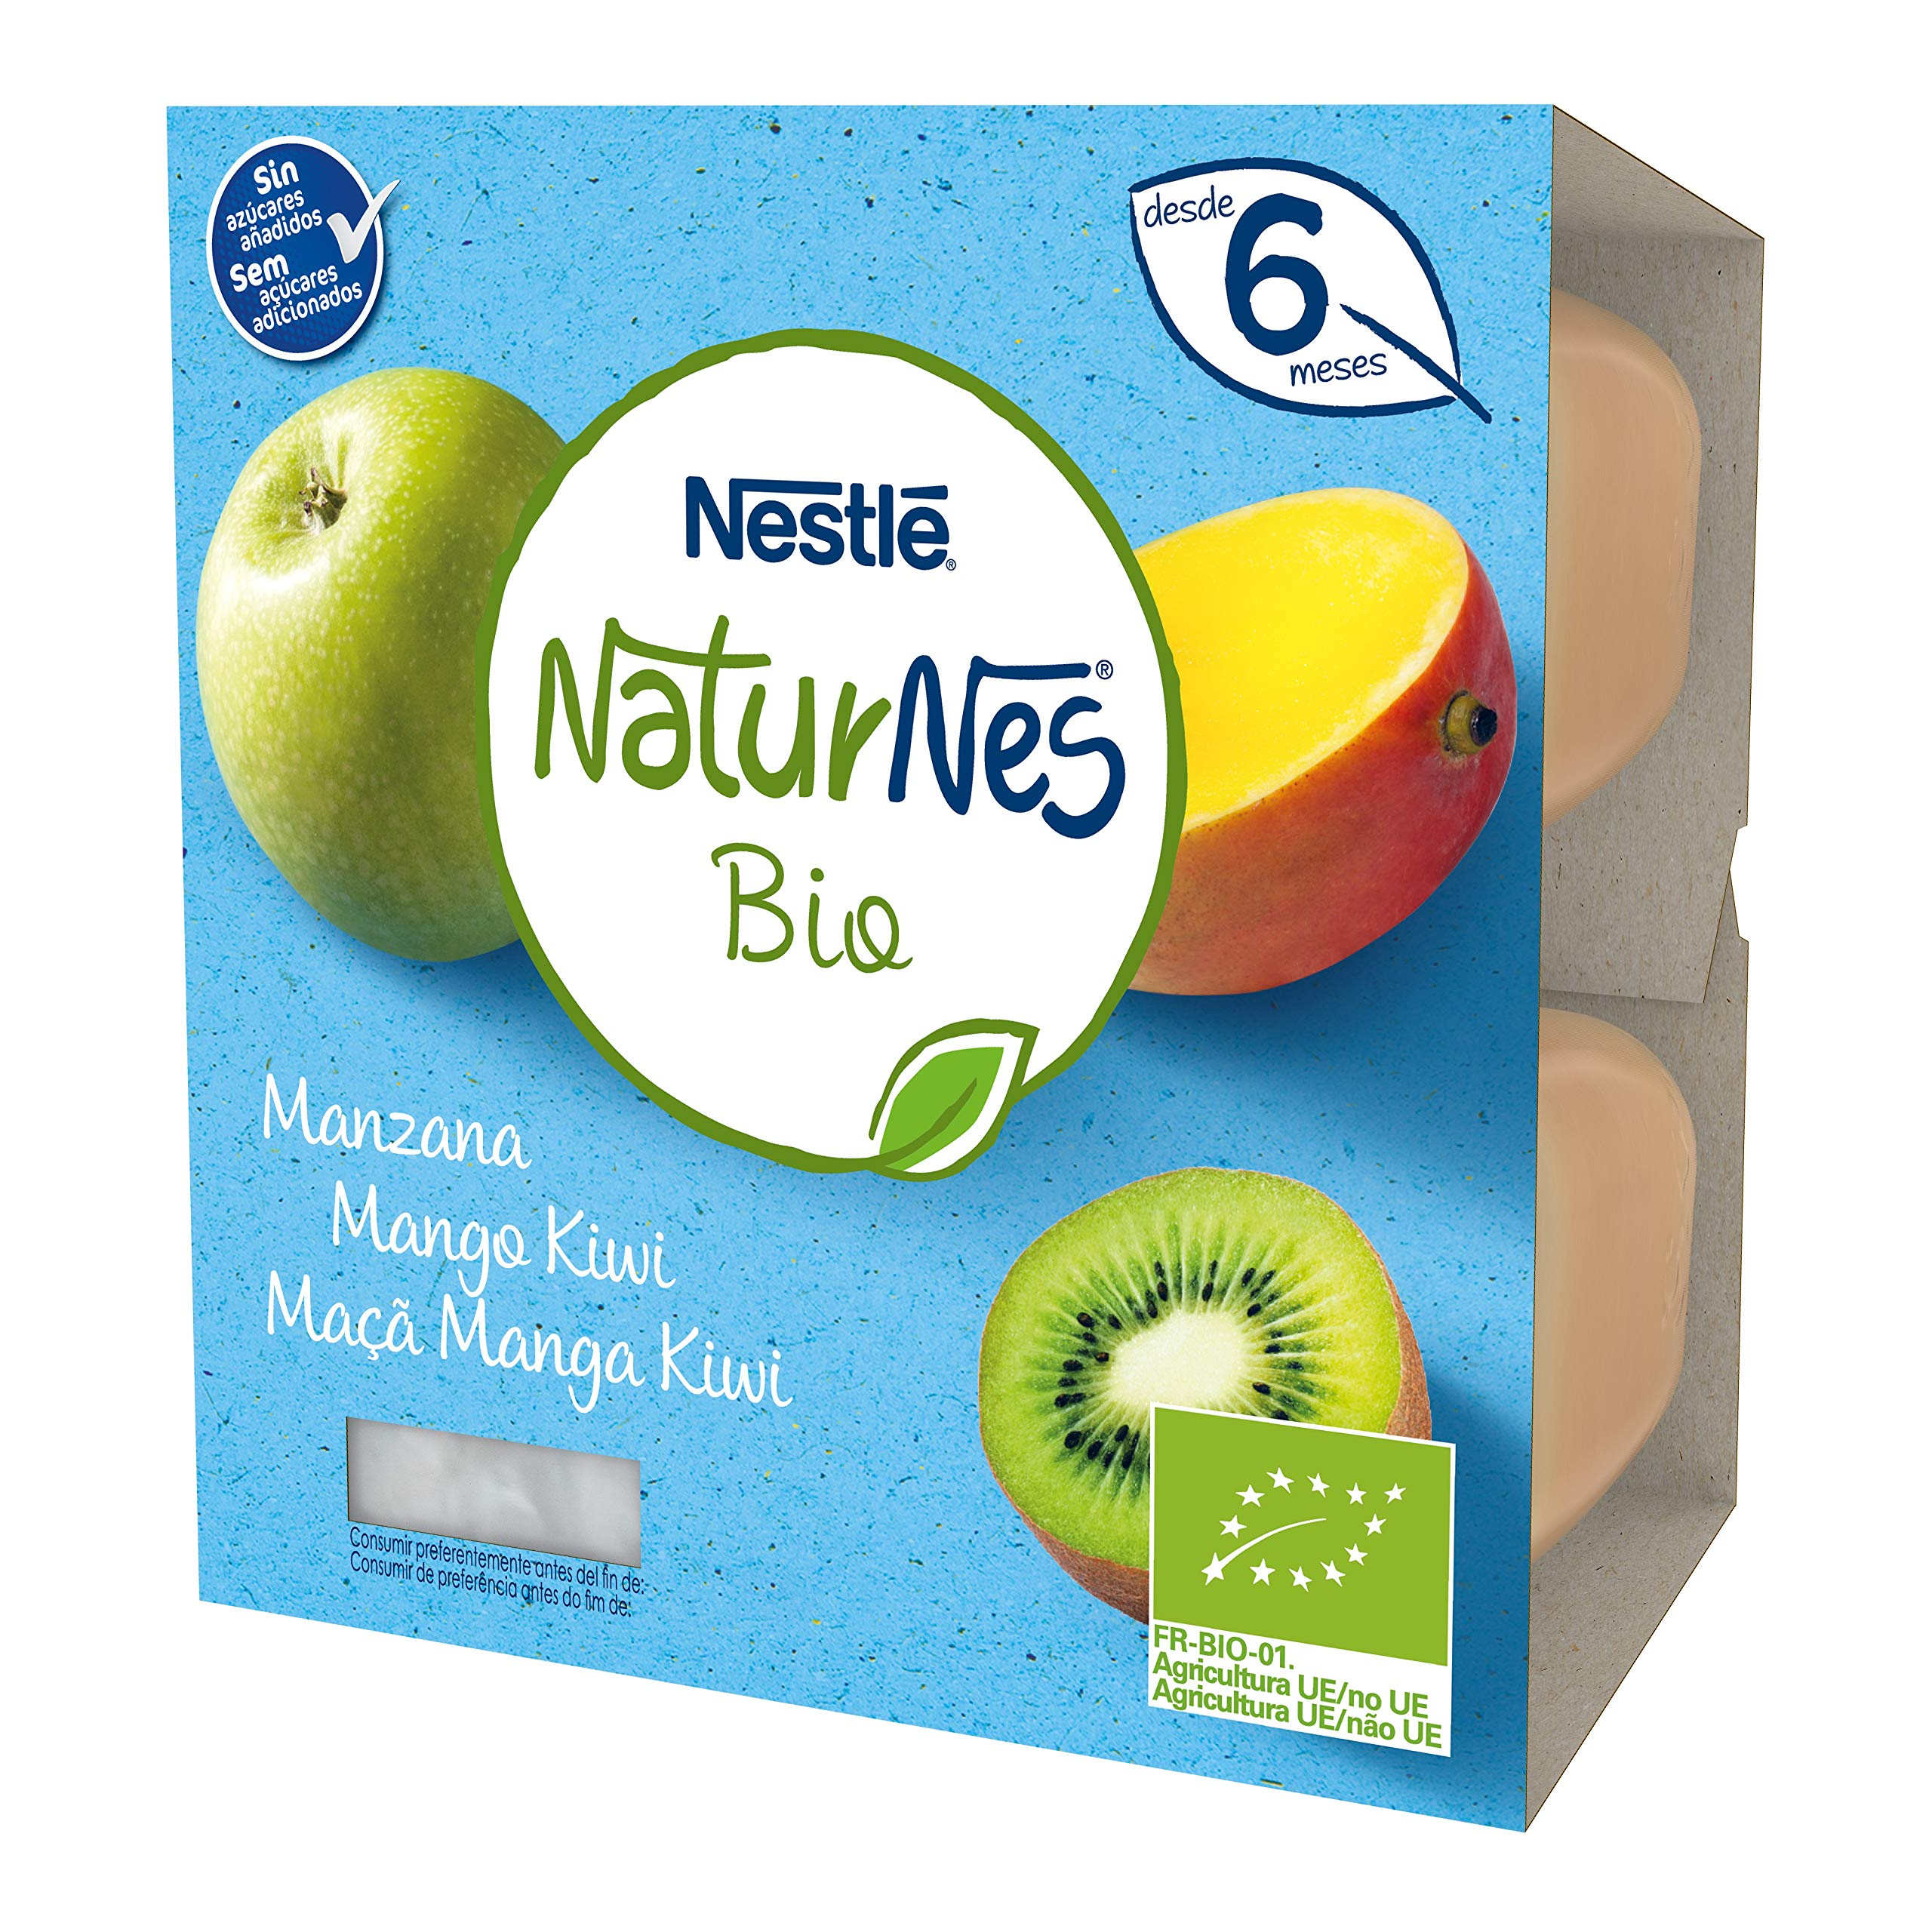 Nestlé Naturnes Bio Tarrina Manzana Mango Kiwi, A Partir De Los 6 Meses - Pack 6 tarrinas 4x90g